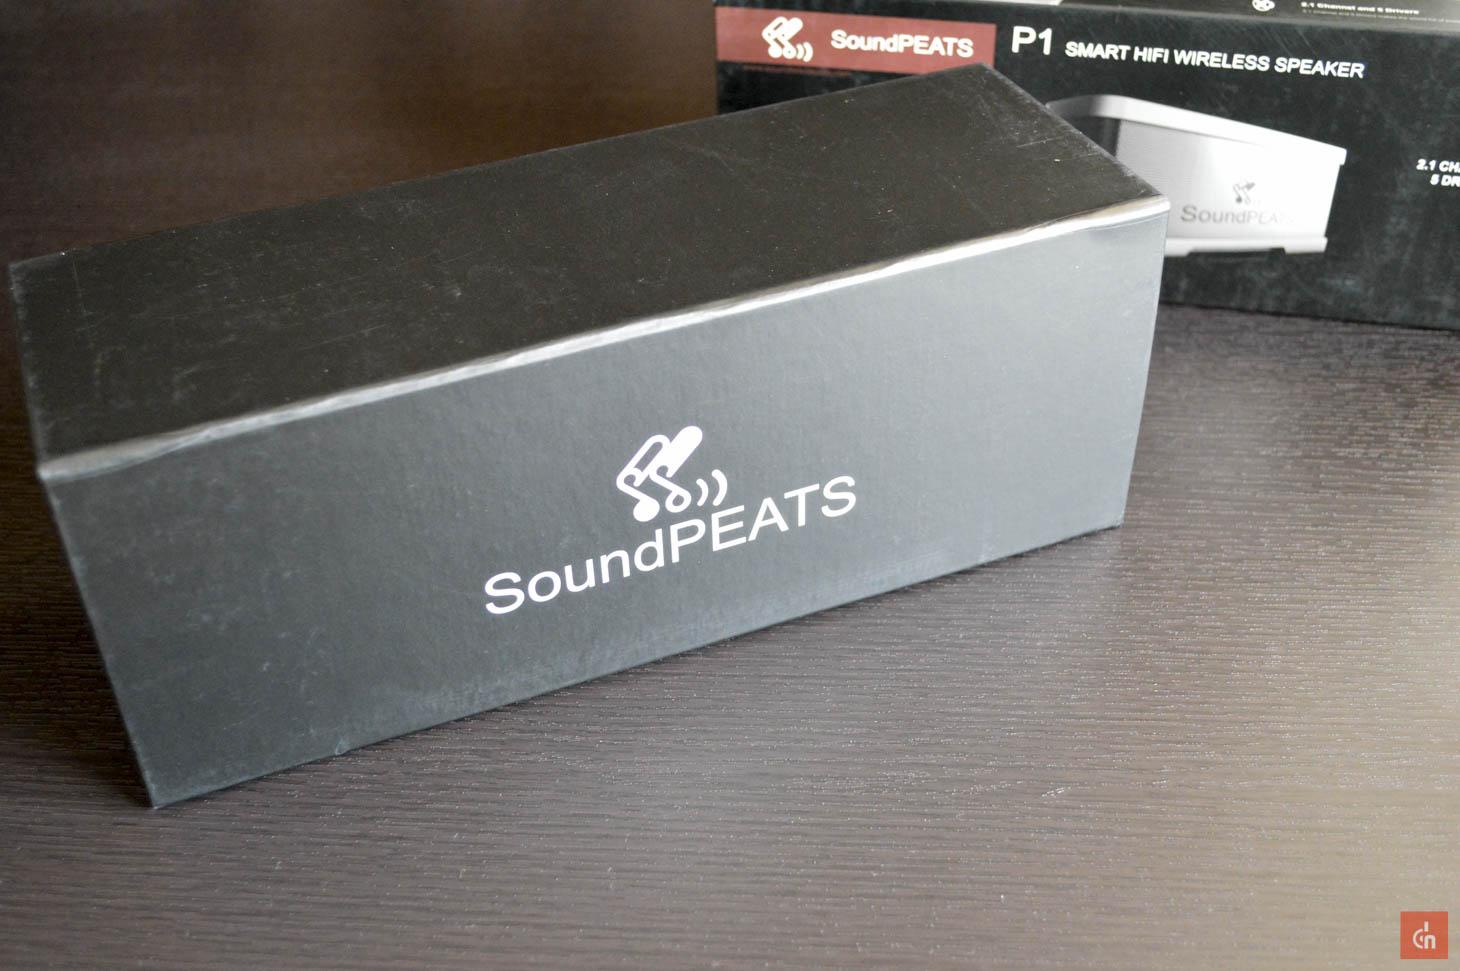 002_20160228_soundpeats-p1